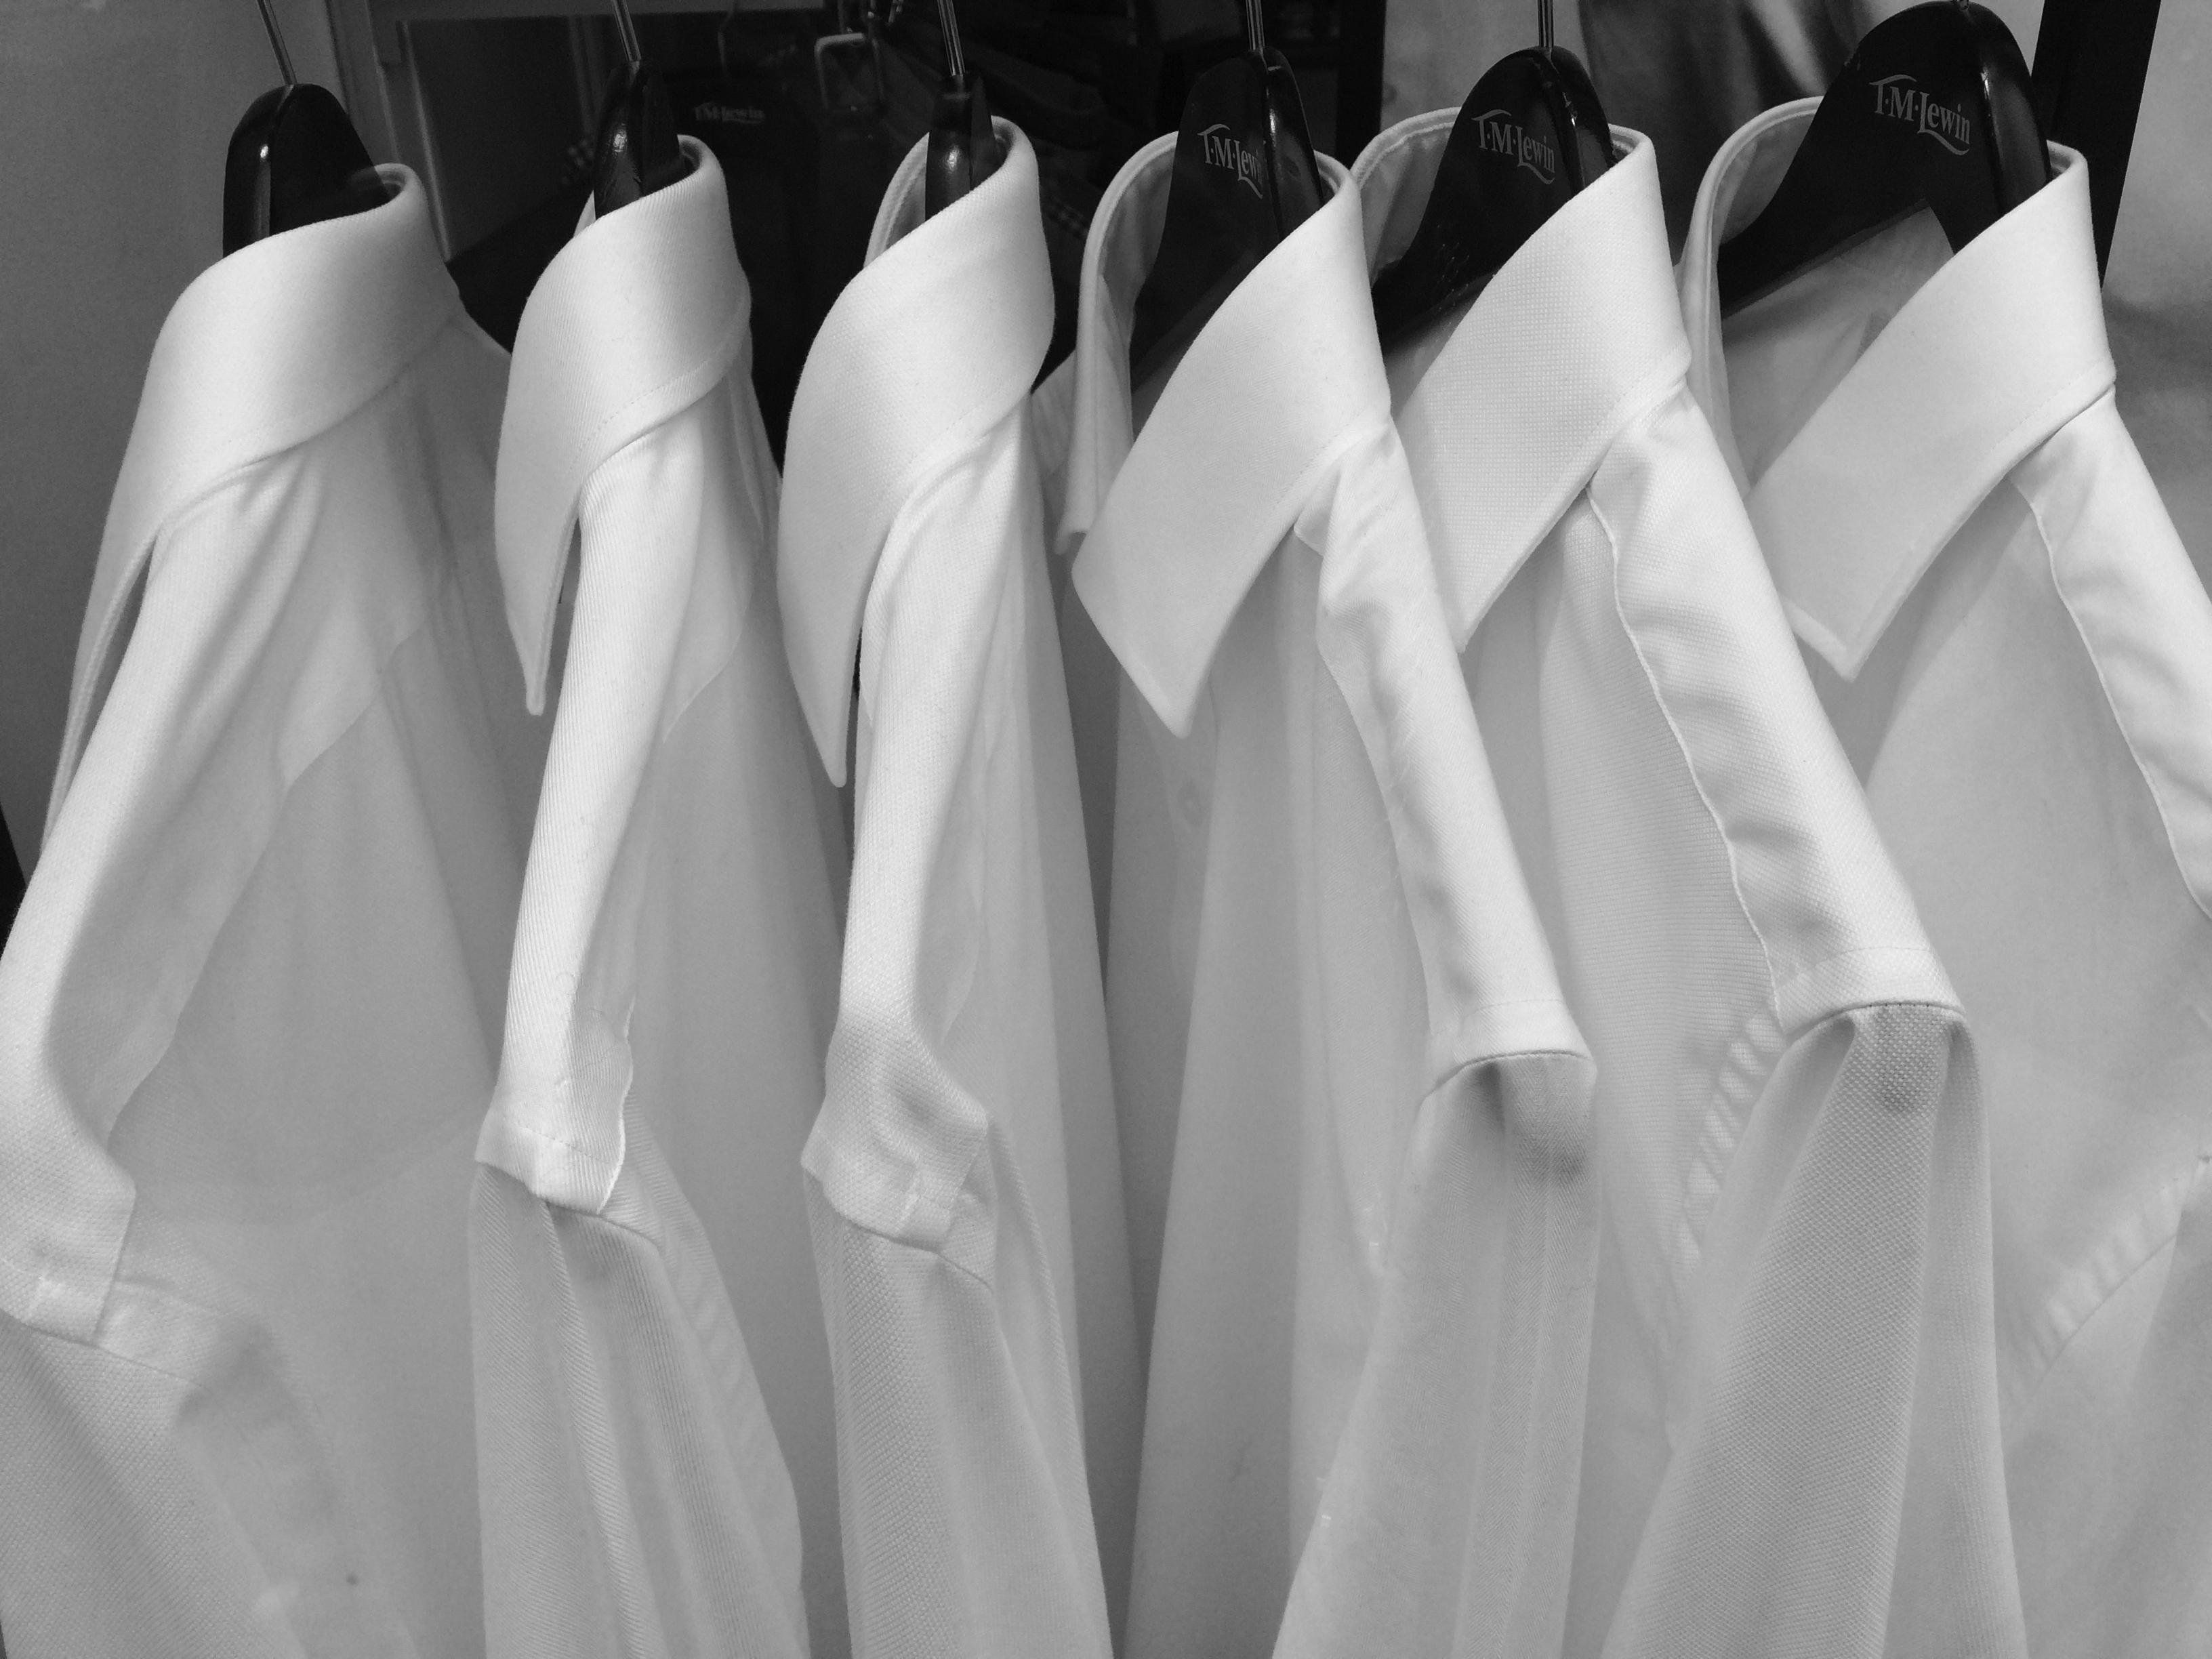 Shirts for fashion